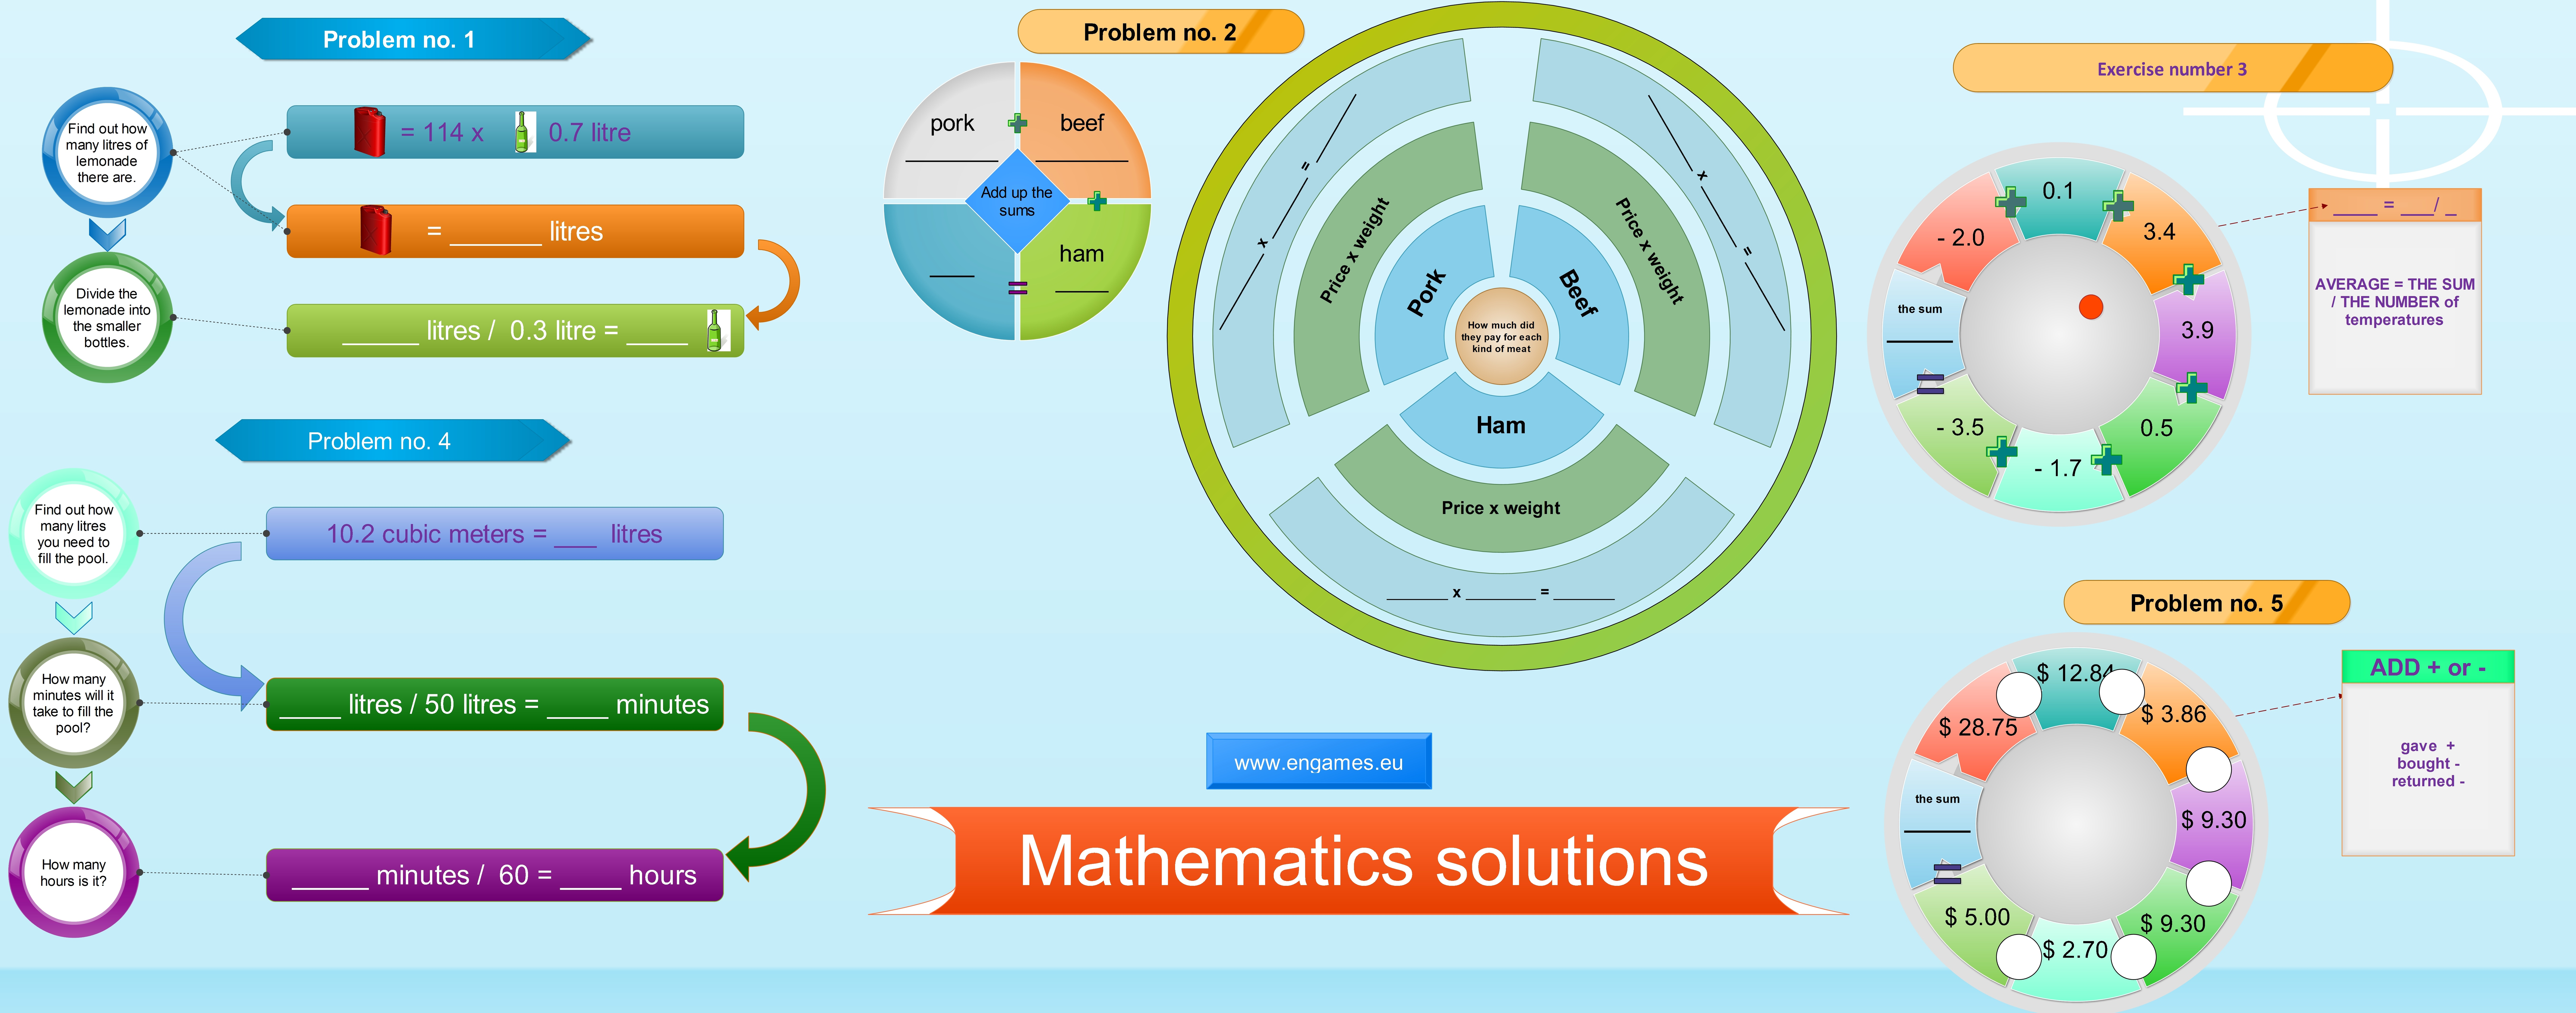 Mathematics solutions Mind map